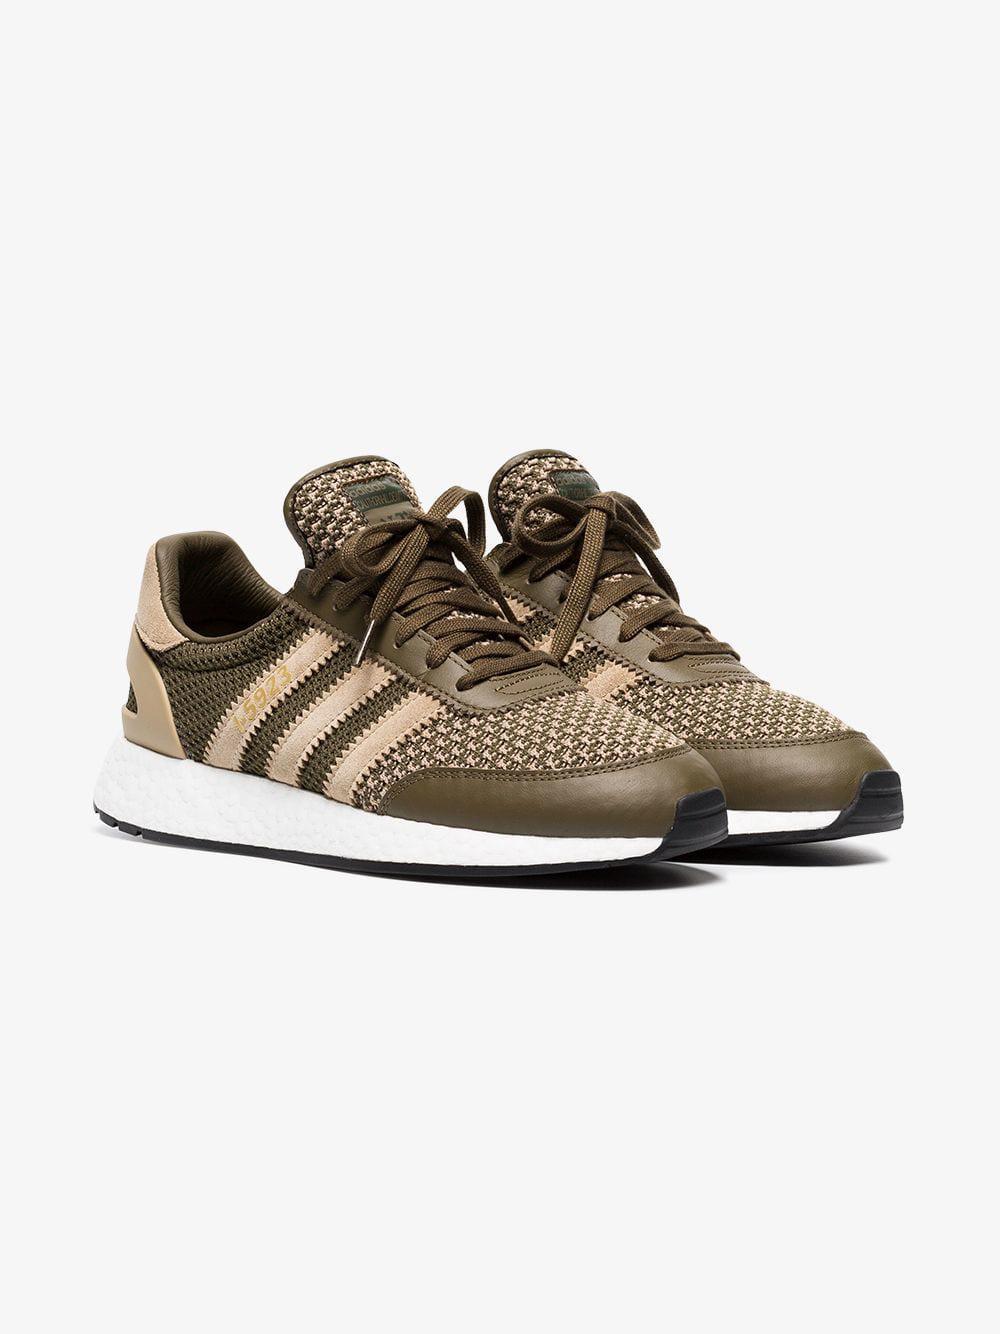 adidas X Neighbourhood 1-5923 Sneakers in Green for Men - Lyst 551ef578f79c